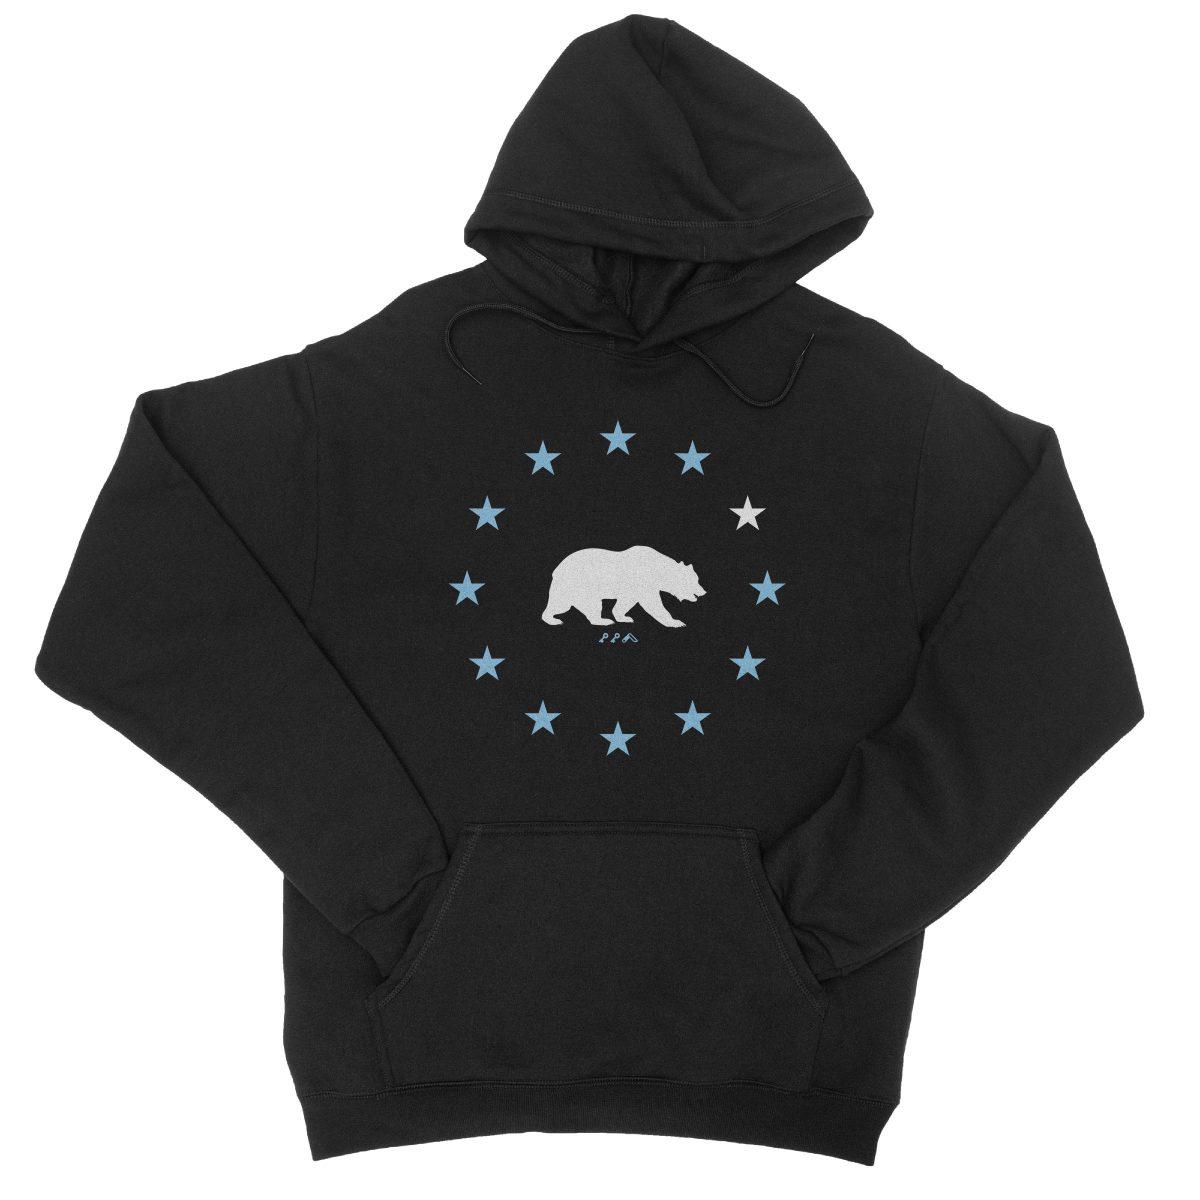 STAR GAZING california republic cali bear hoodie in black by kikicutt